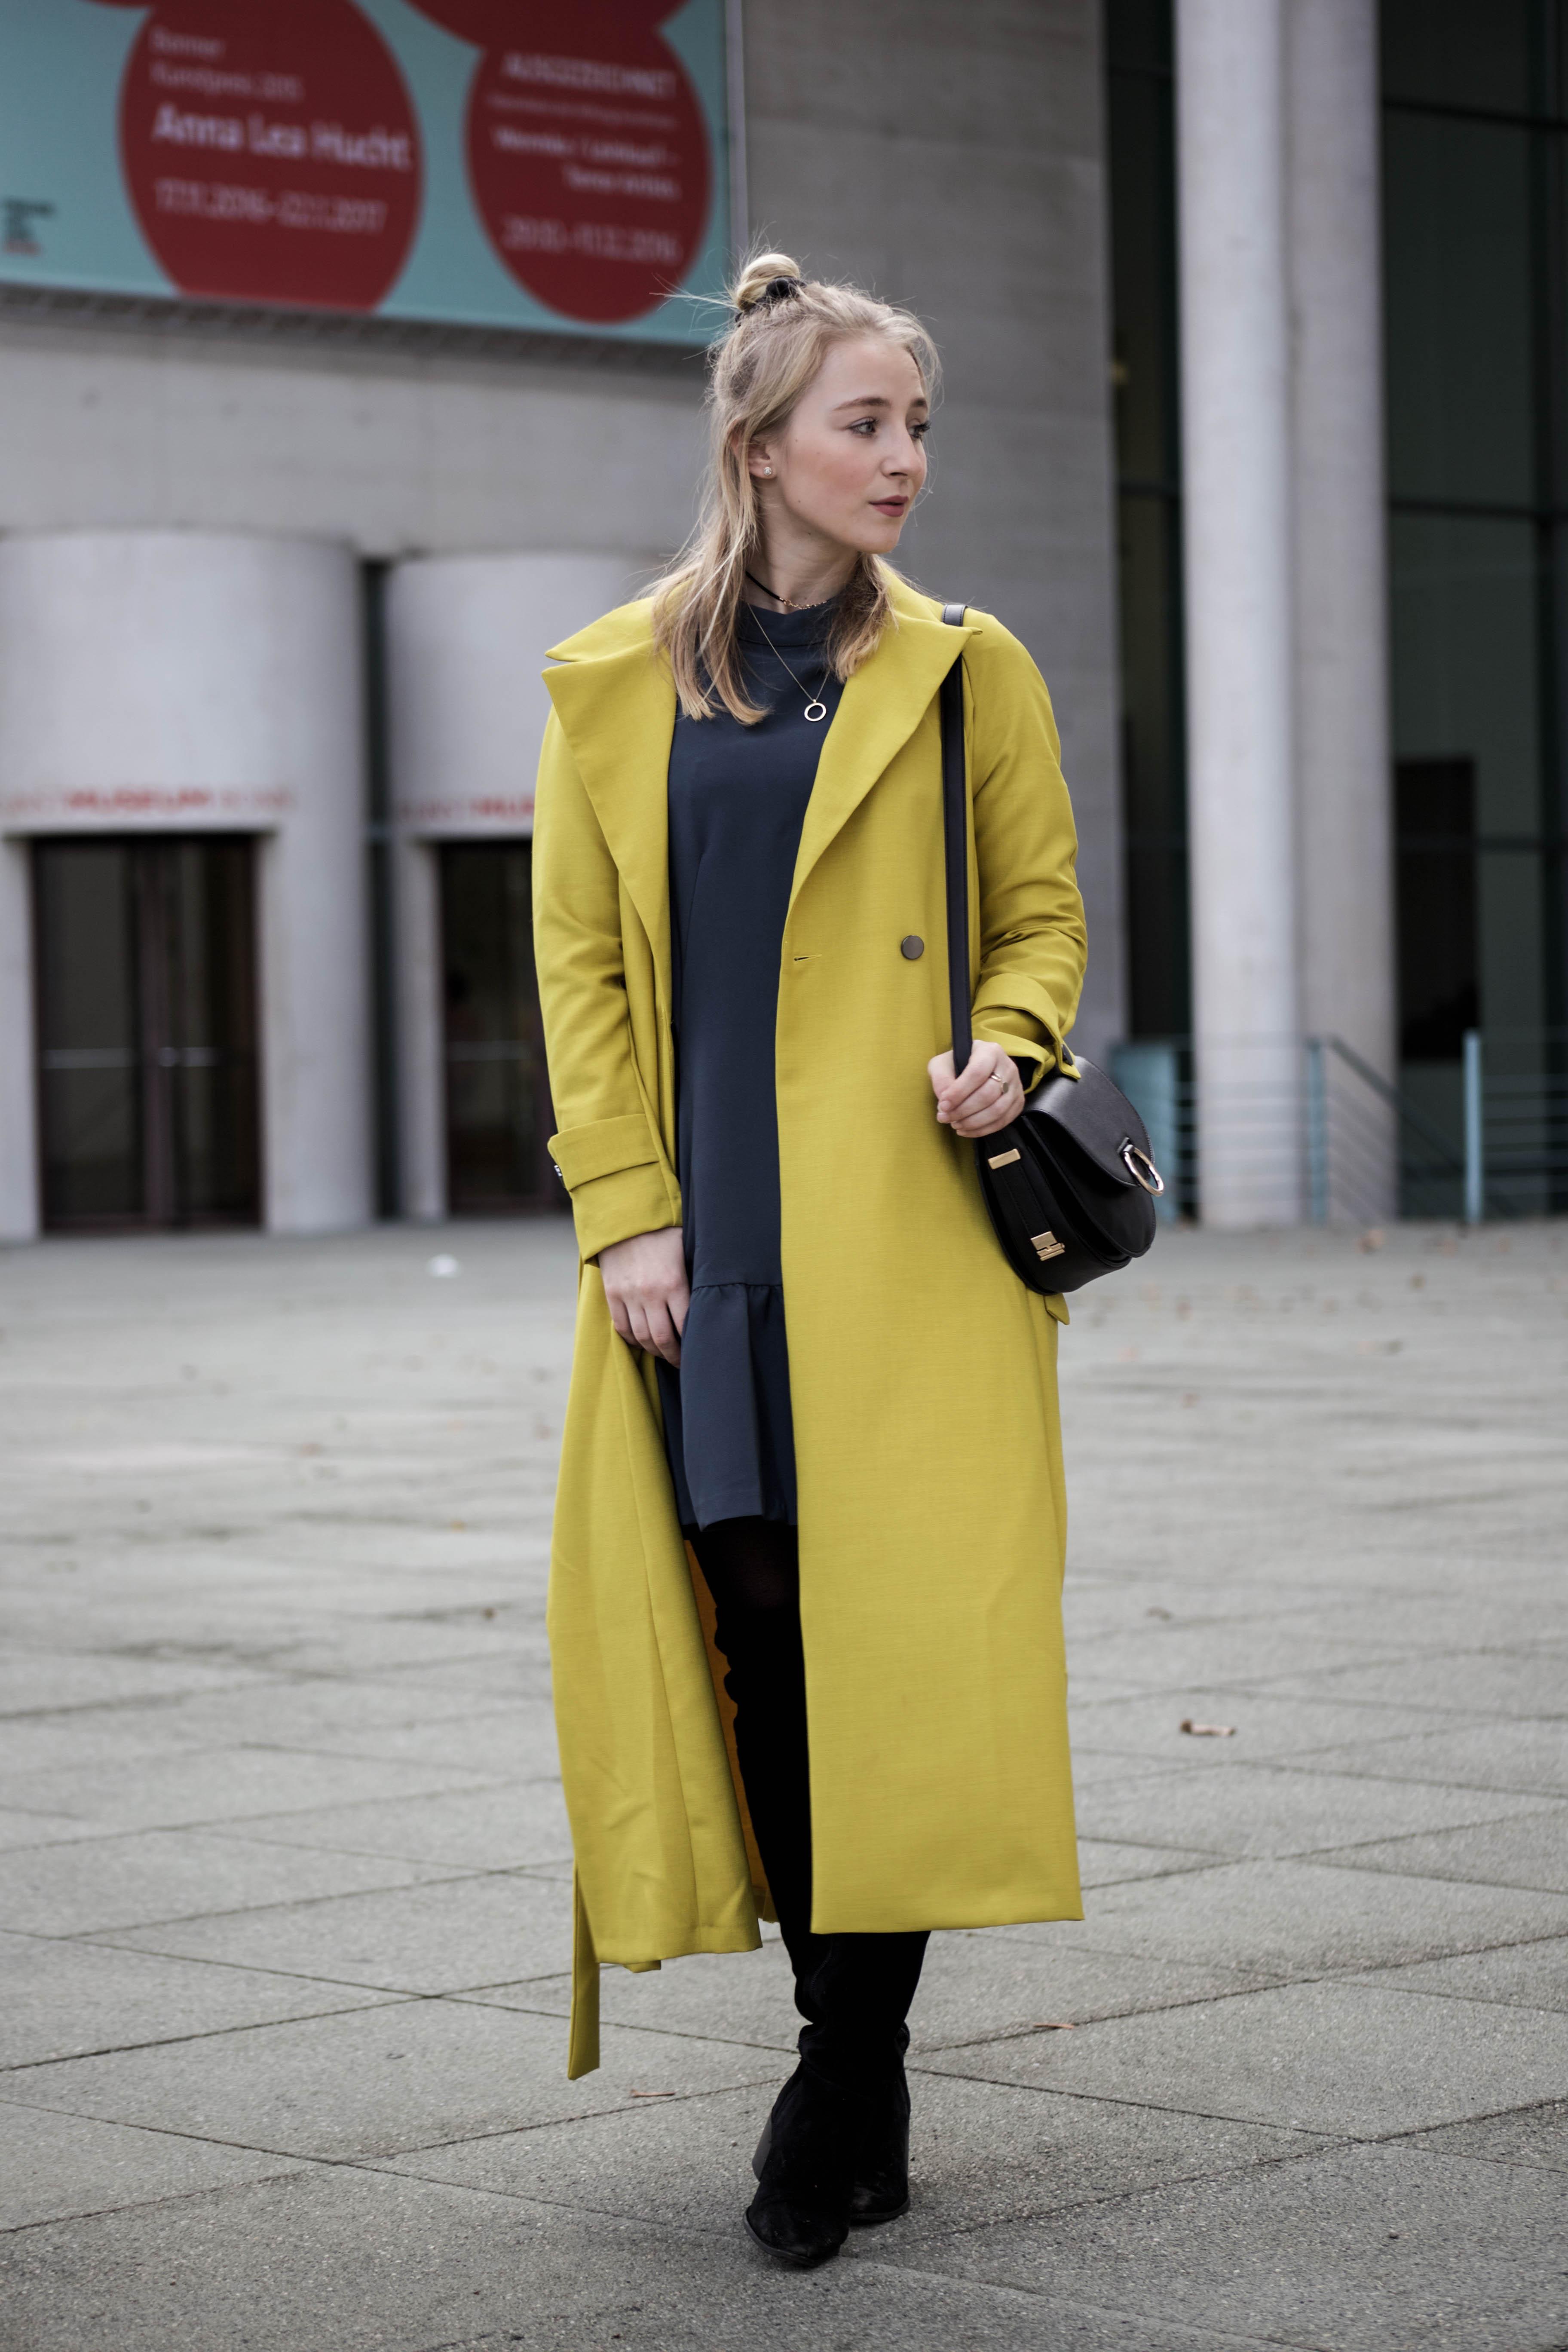 lemon-coat-volantkleid-herbstoutfit-fashionblog-modeblog-koeln-bonn-berlin_8137